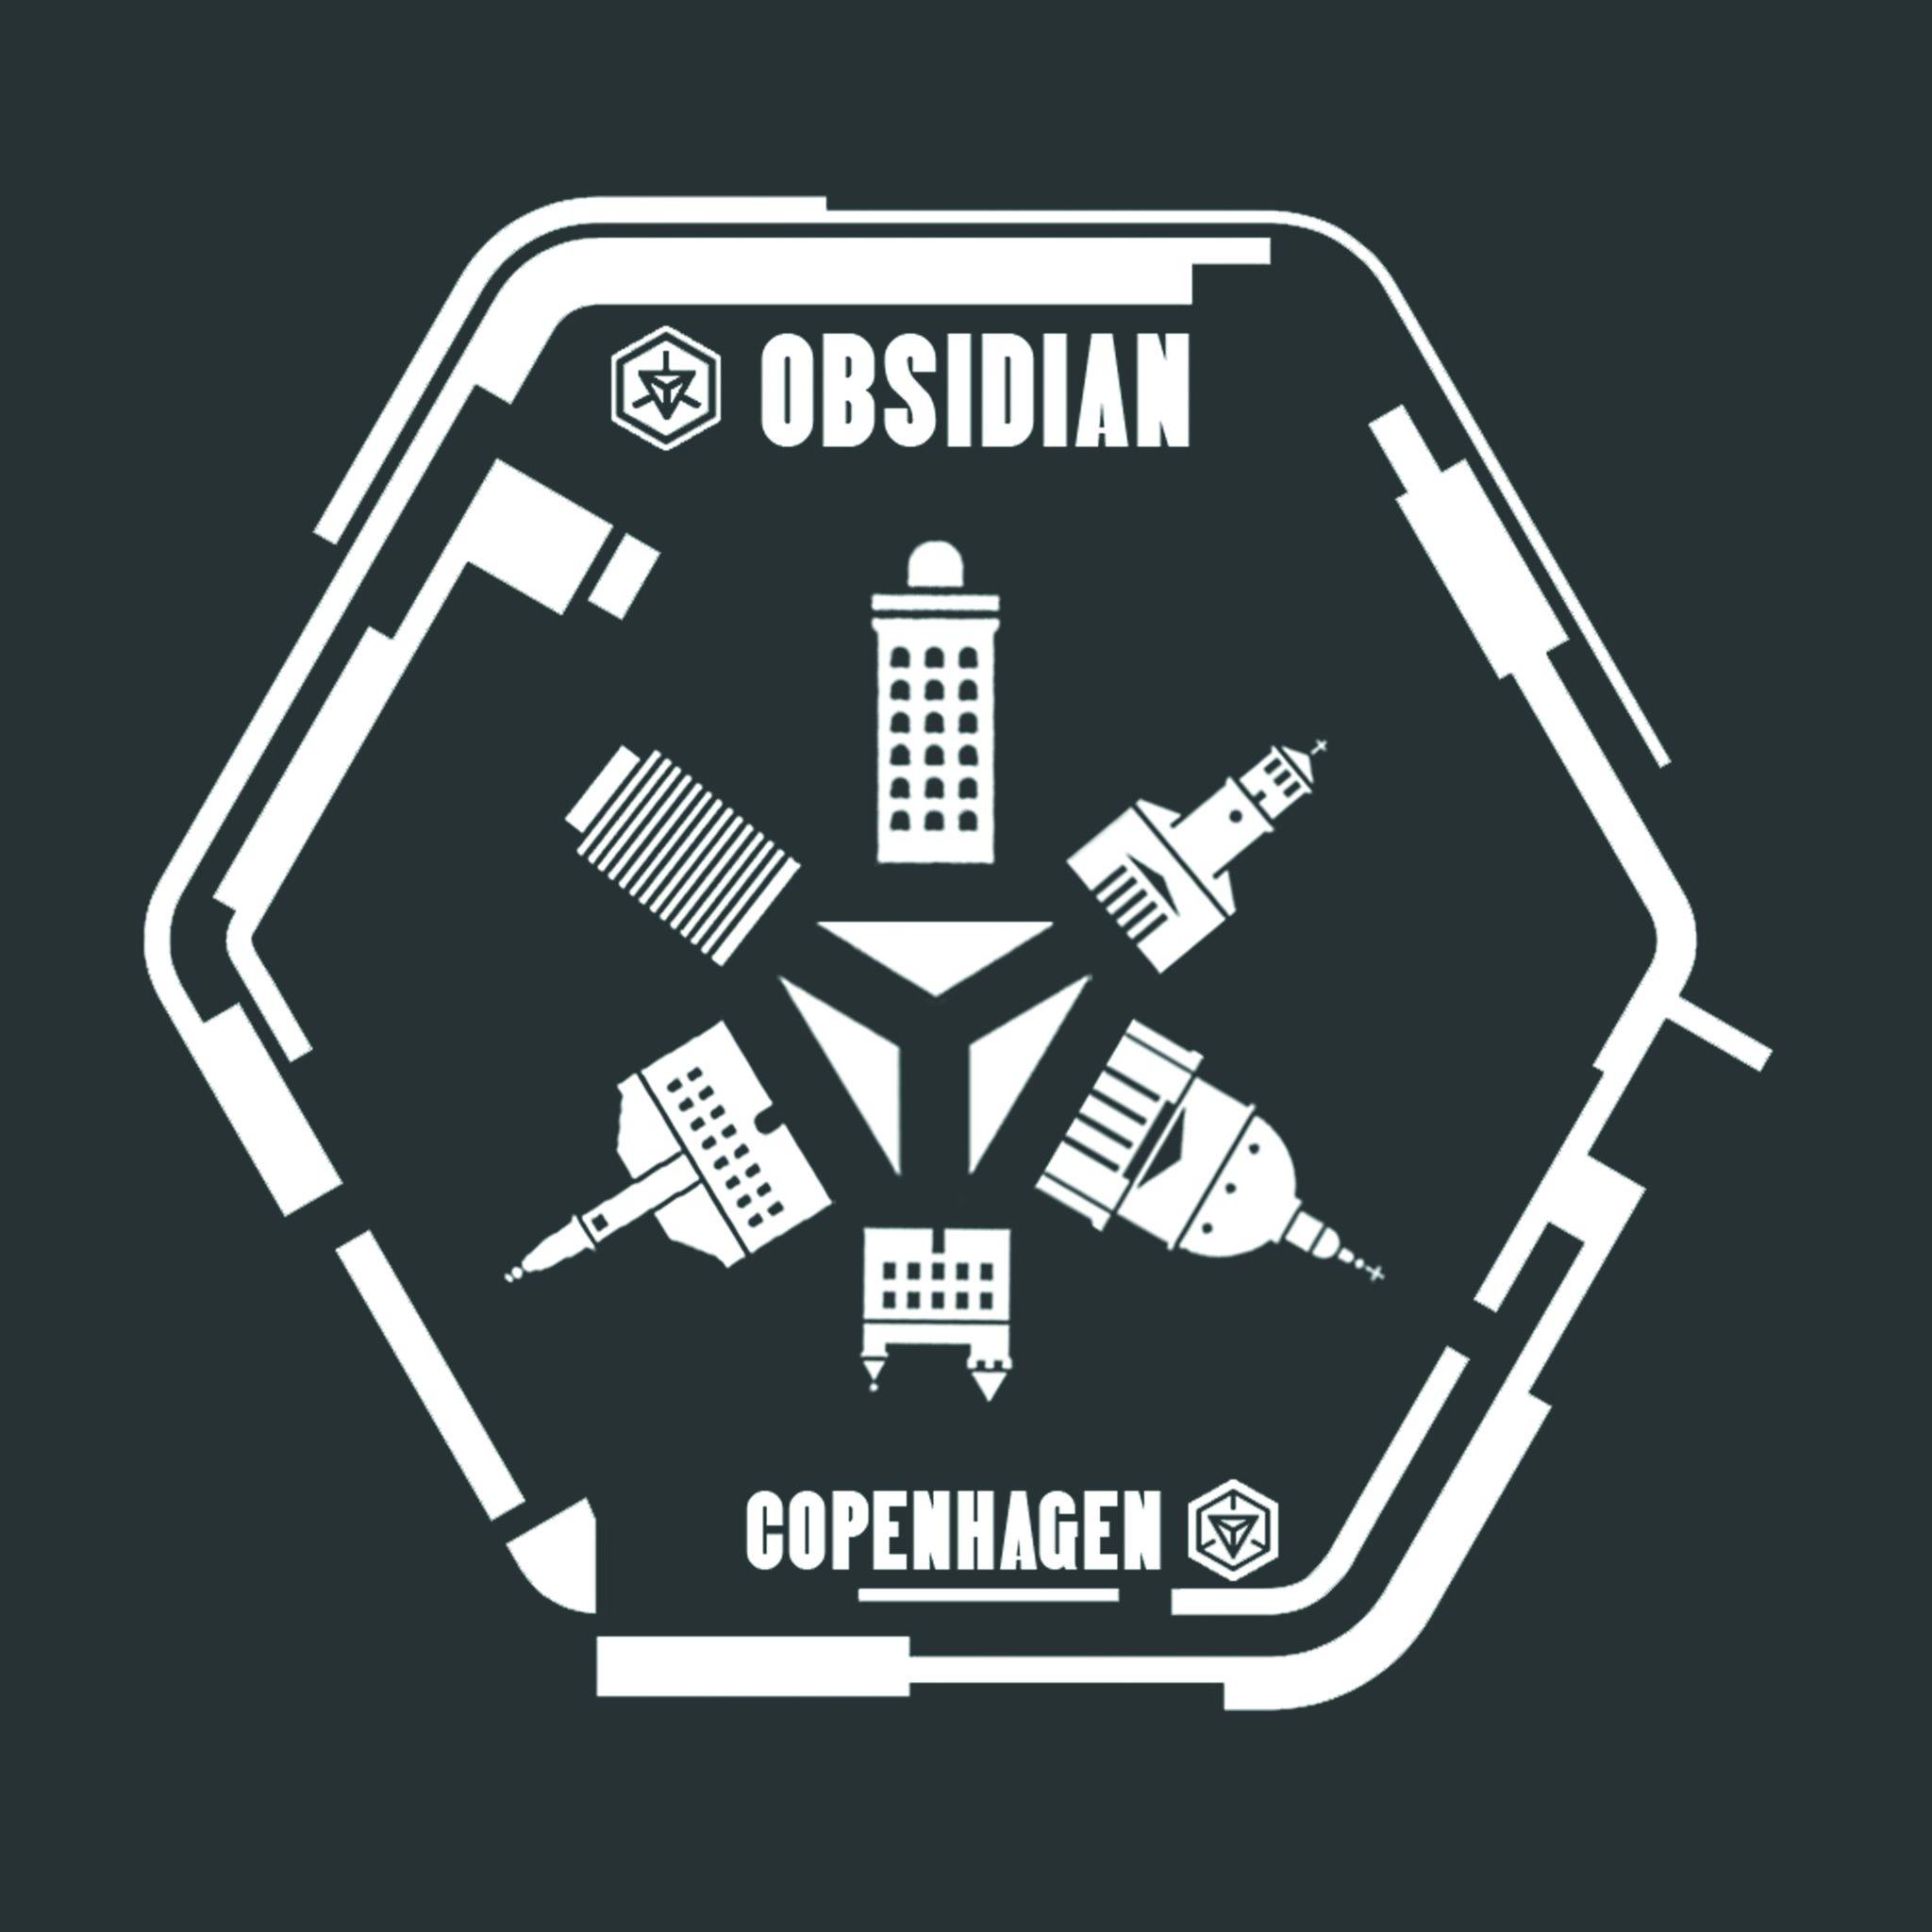 Obsidian Copenhagen